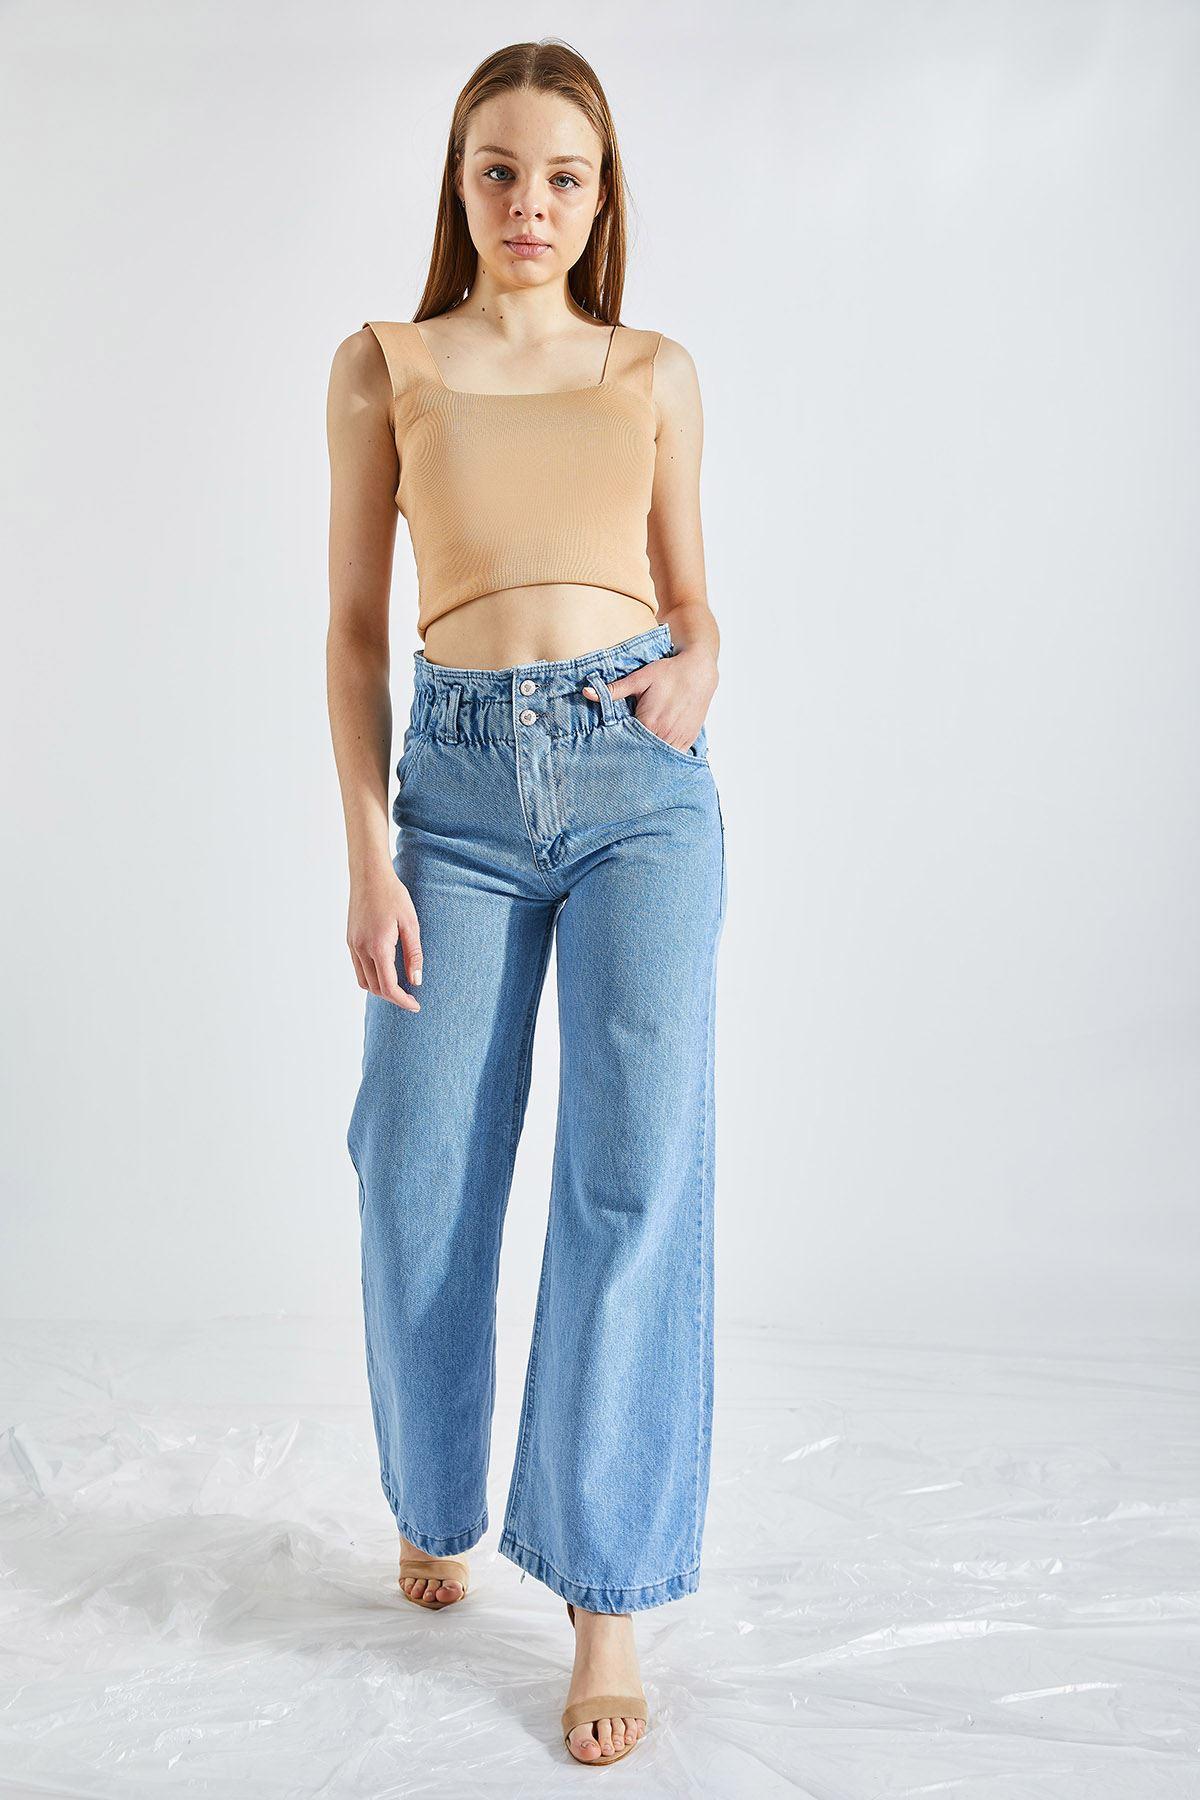 Kadın Bel Lastikli İspanyol Mavi Kot Pantolon